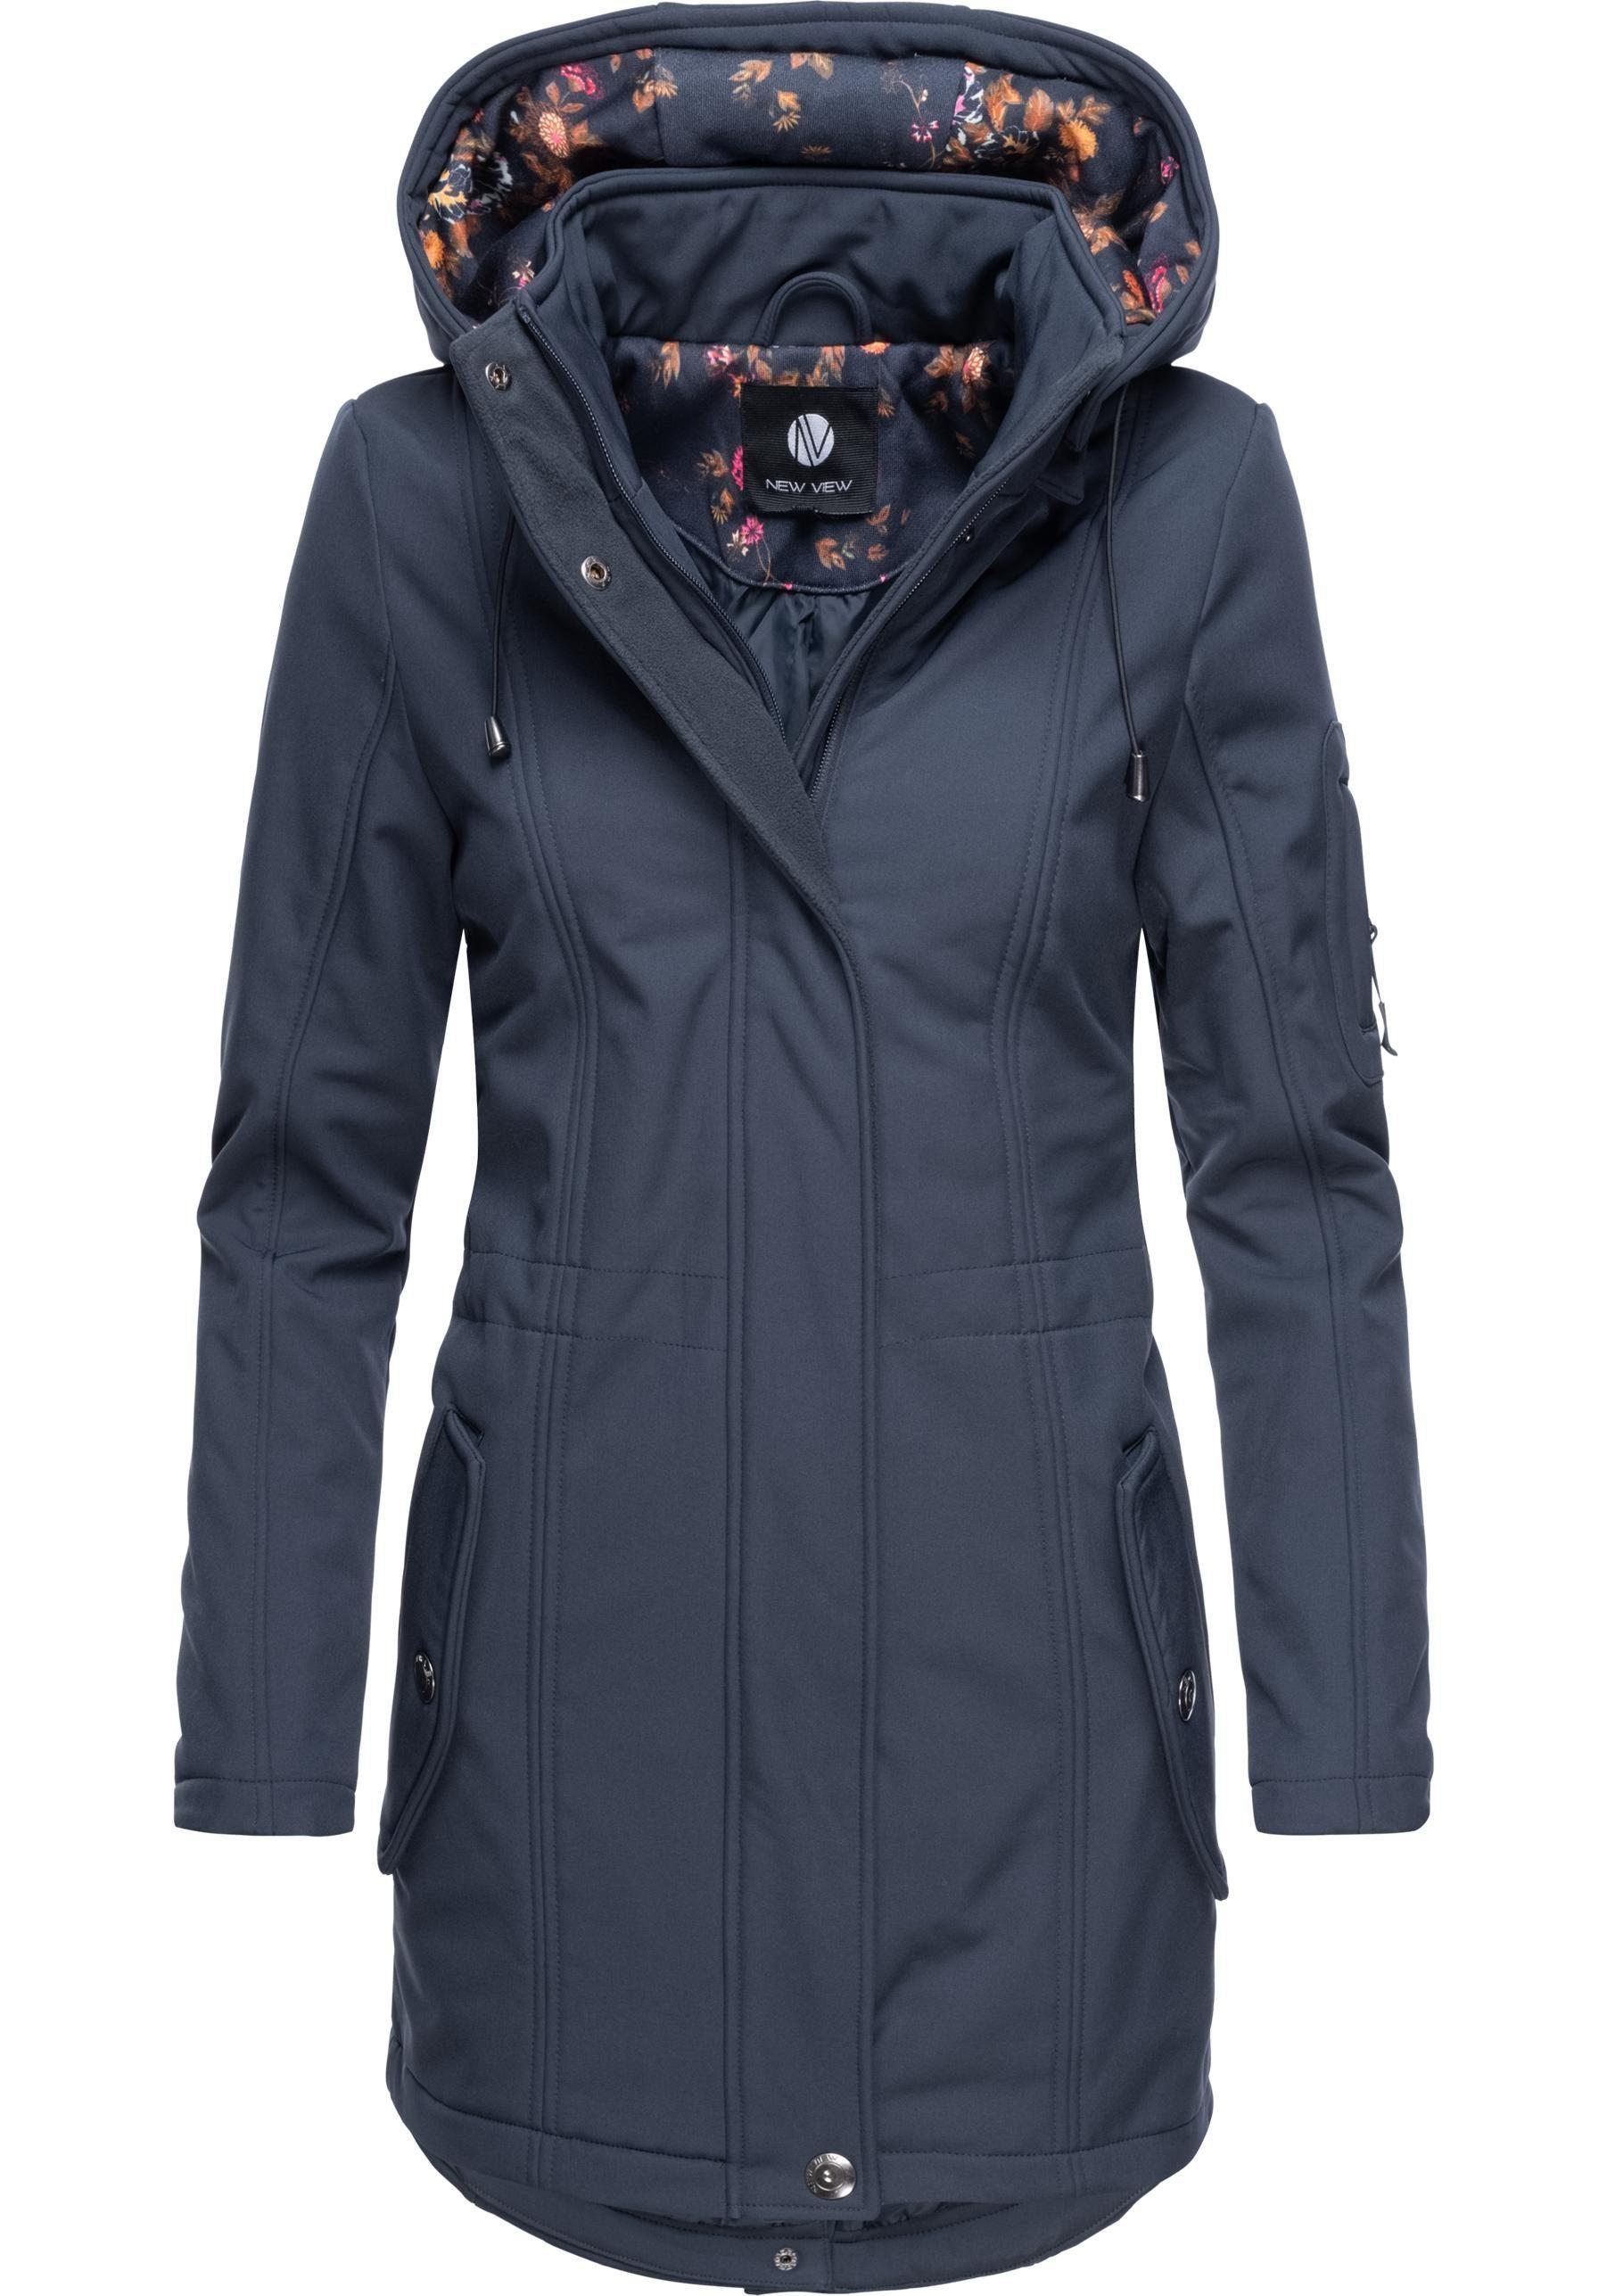 S-XL AKTION Elegante Damen Qualitäts Softshell Jacke schwarz Gr